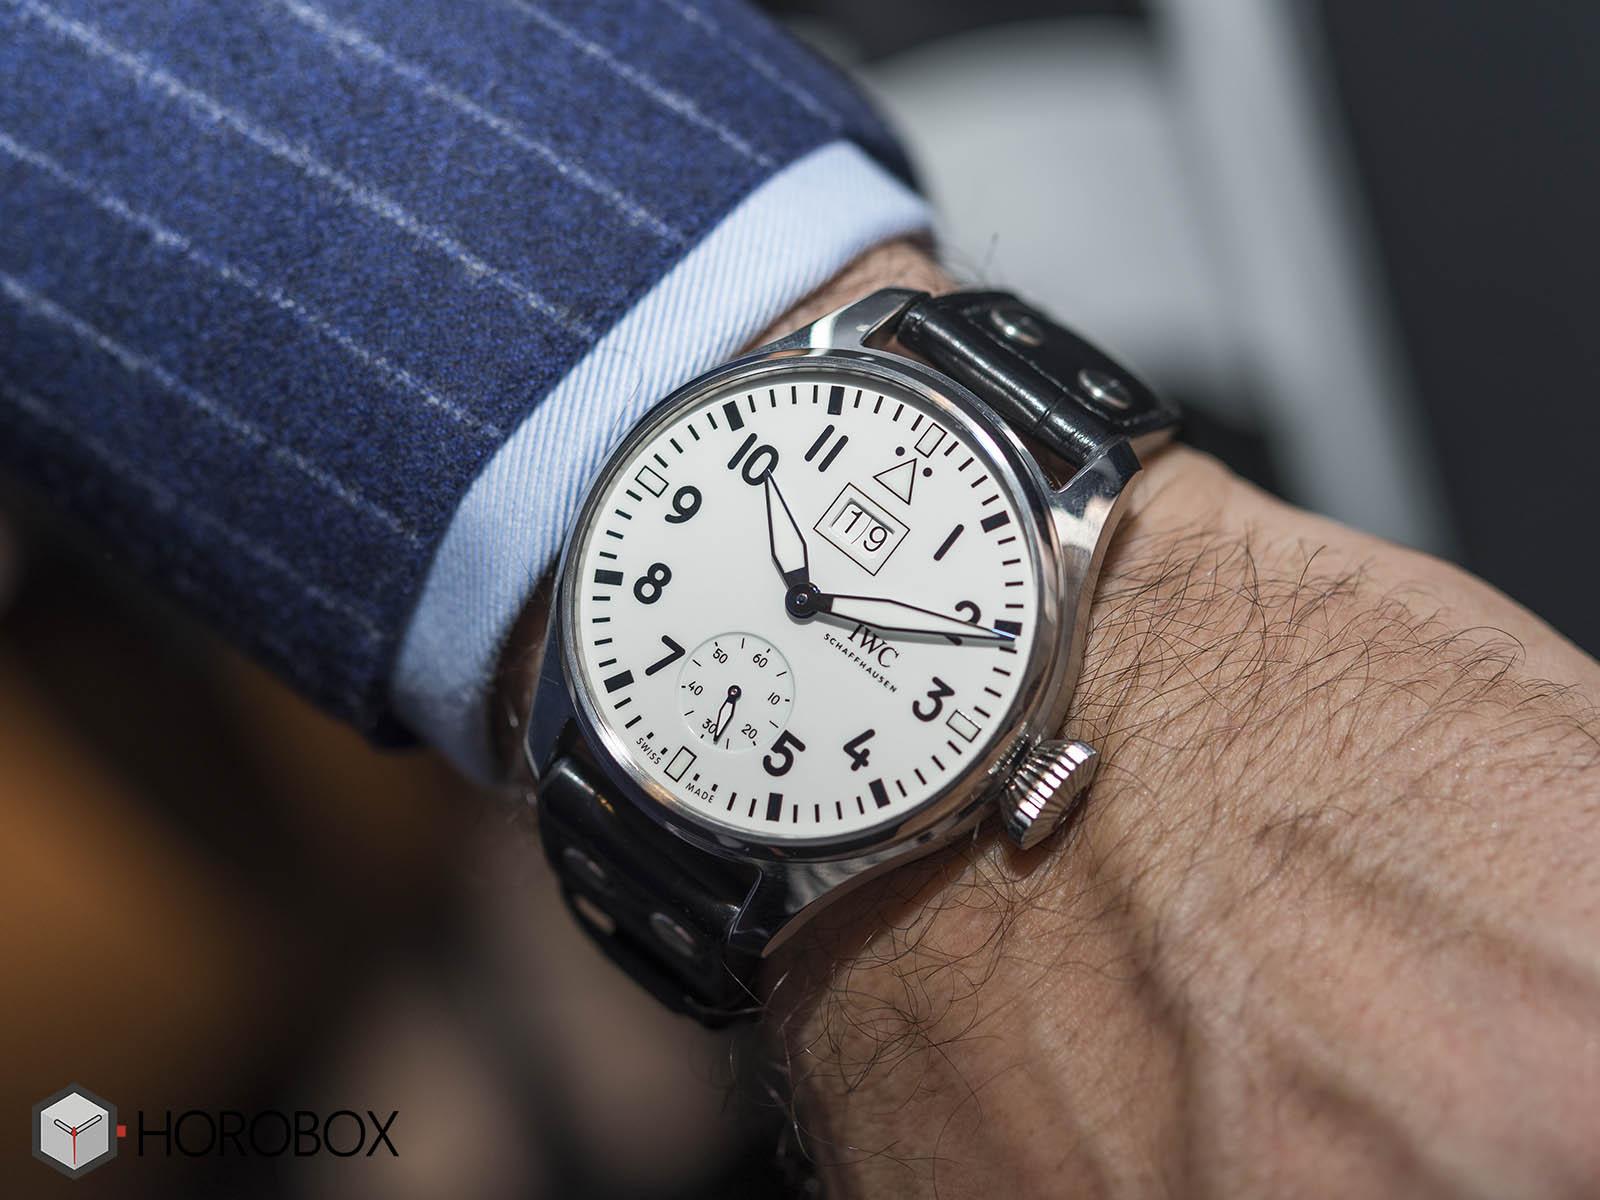 iw510504-iwc-Big-Pilot-s-Watch-Big-Date-Edition-150-Years-Sihh2018-7.jpg